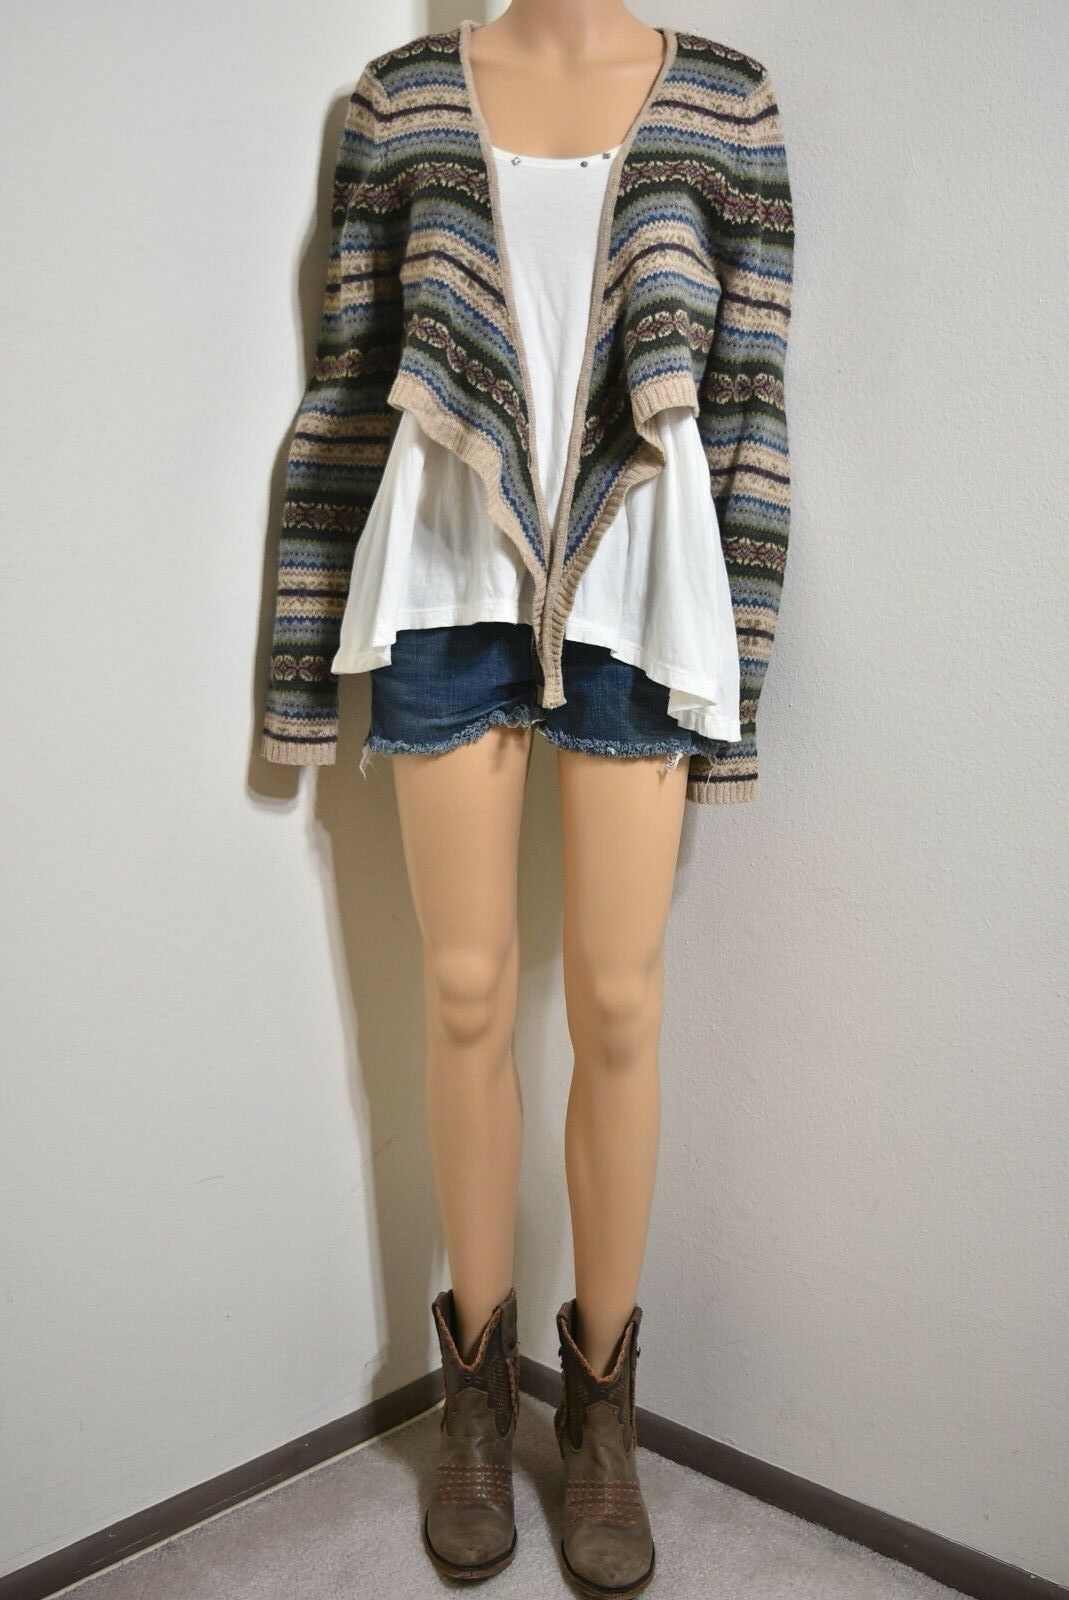 Ralph Lauren Lambswool Sweater womens multi color crop top Southwestern Size XL